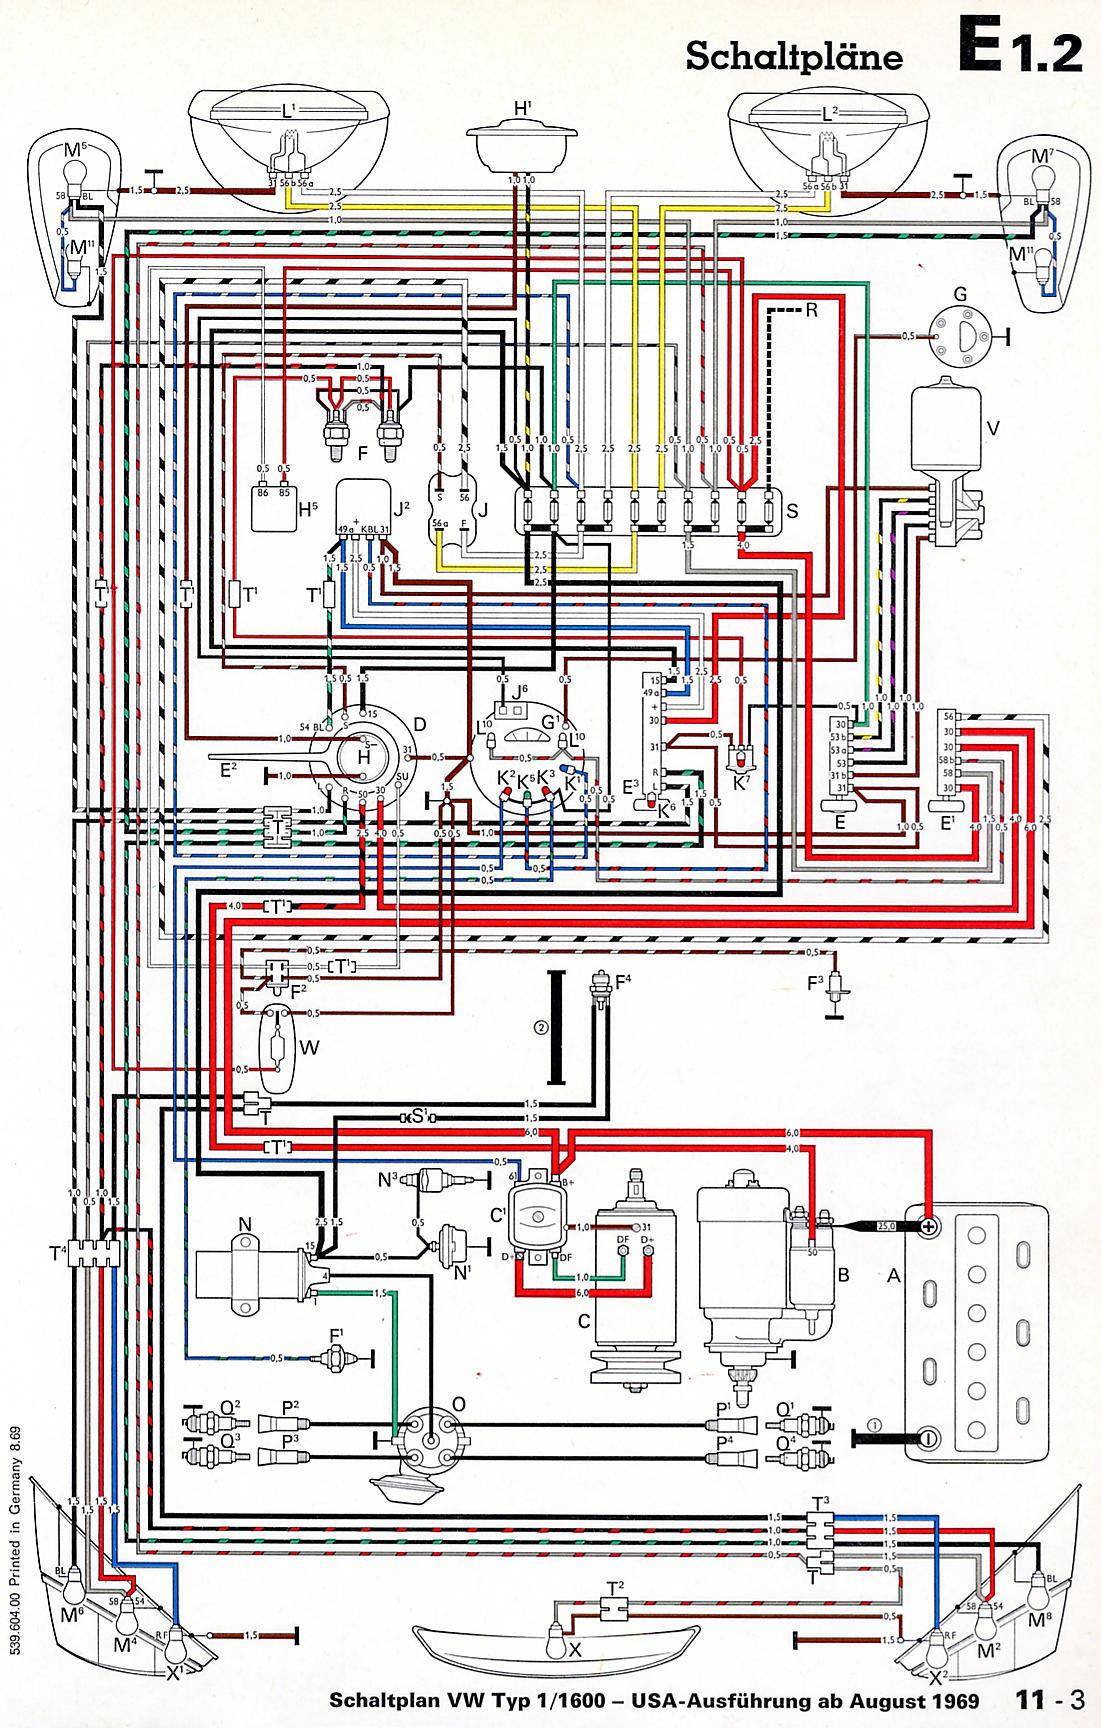 Vw lupo electric window wiring diagram somurich